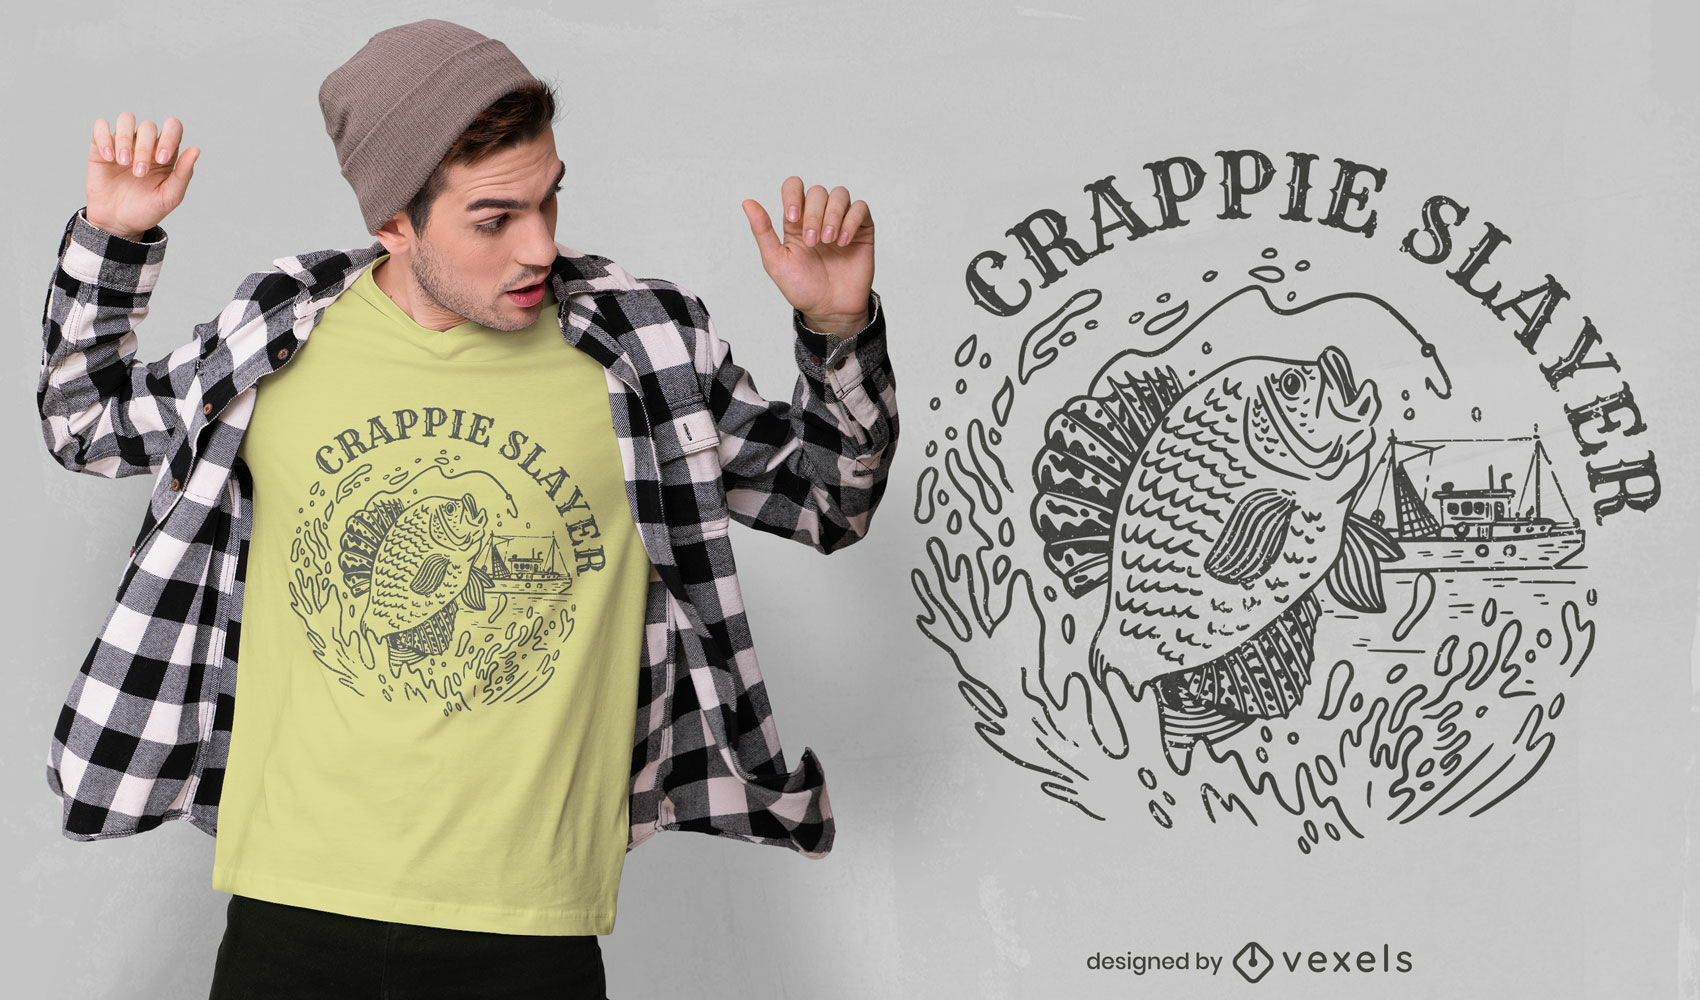 Crappie slayer fishing t-shirt design